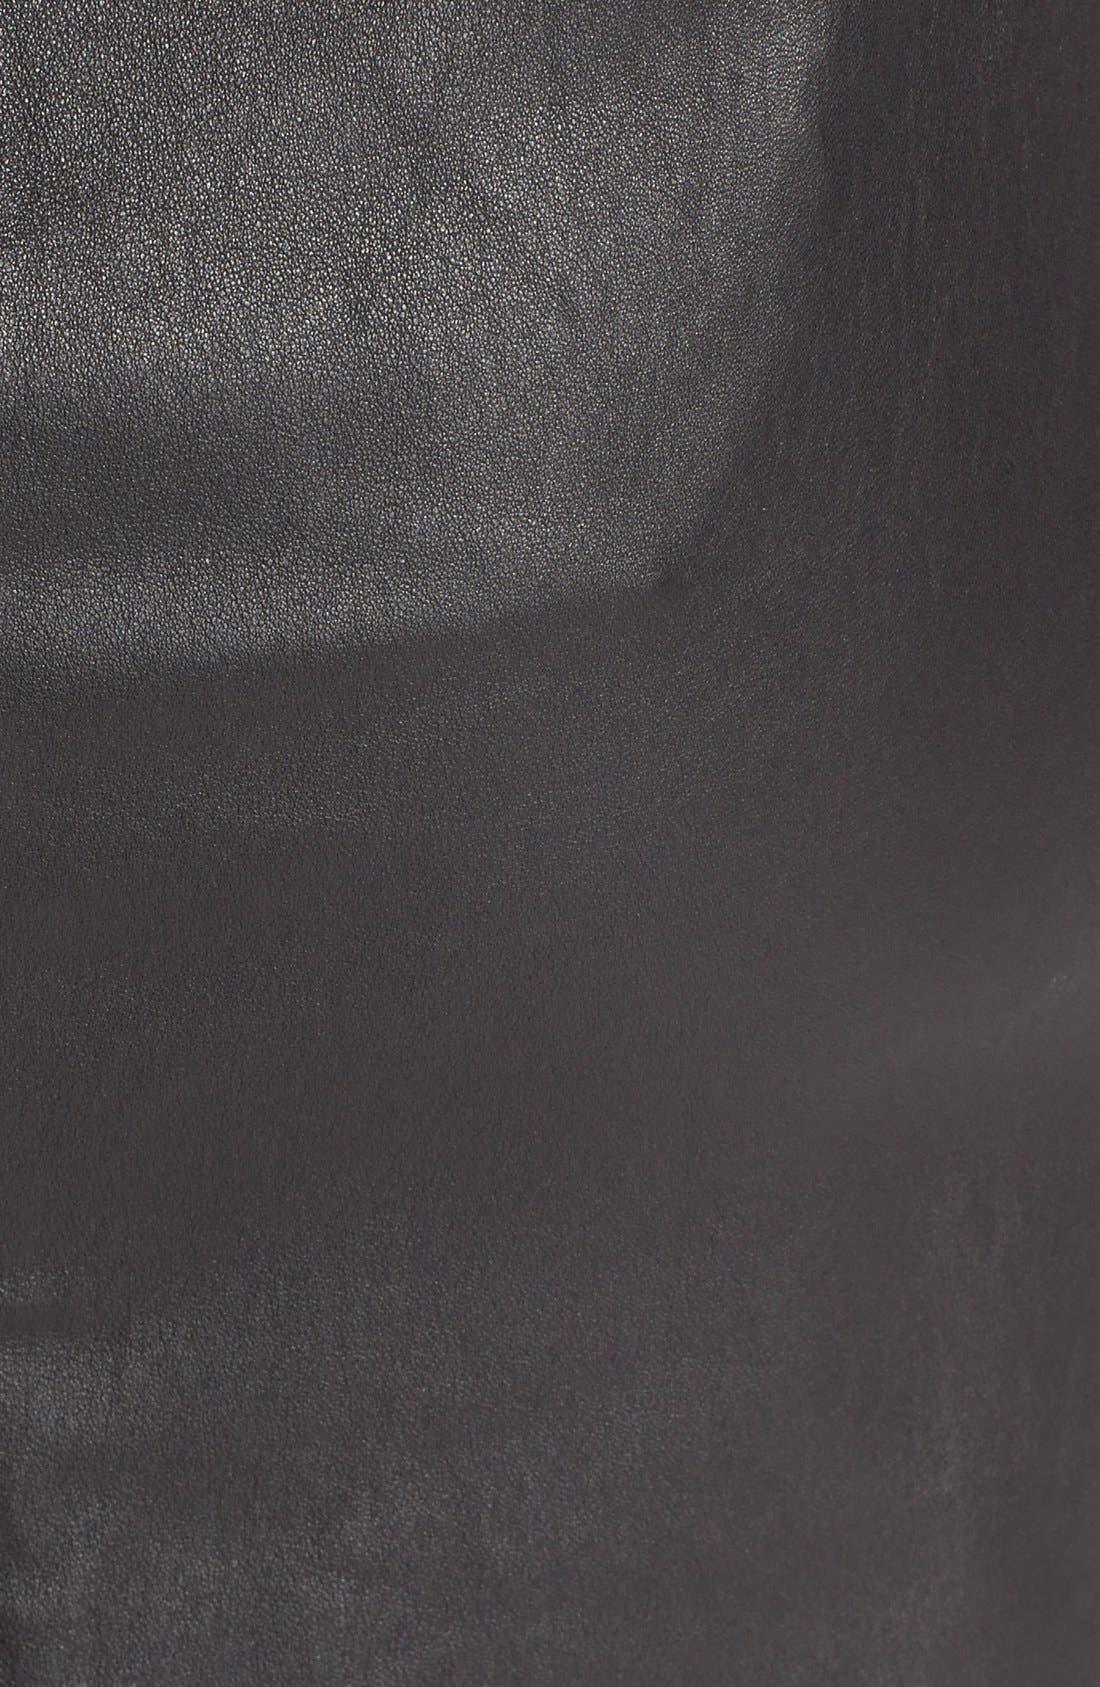 Alternate Image 3  - Diane vonFurstenberg'Cloe' Leather Pencil Skirt